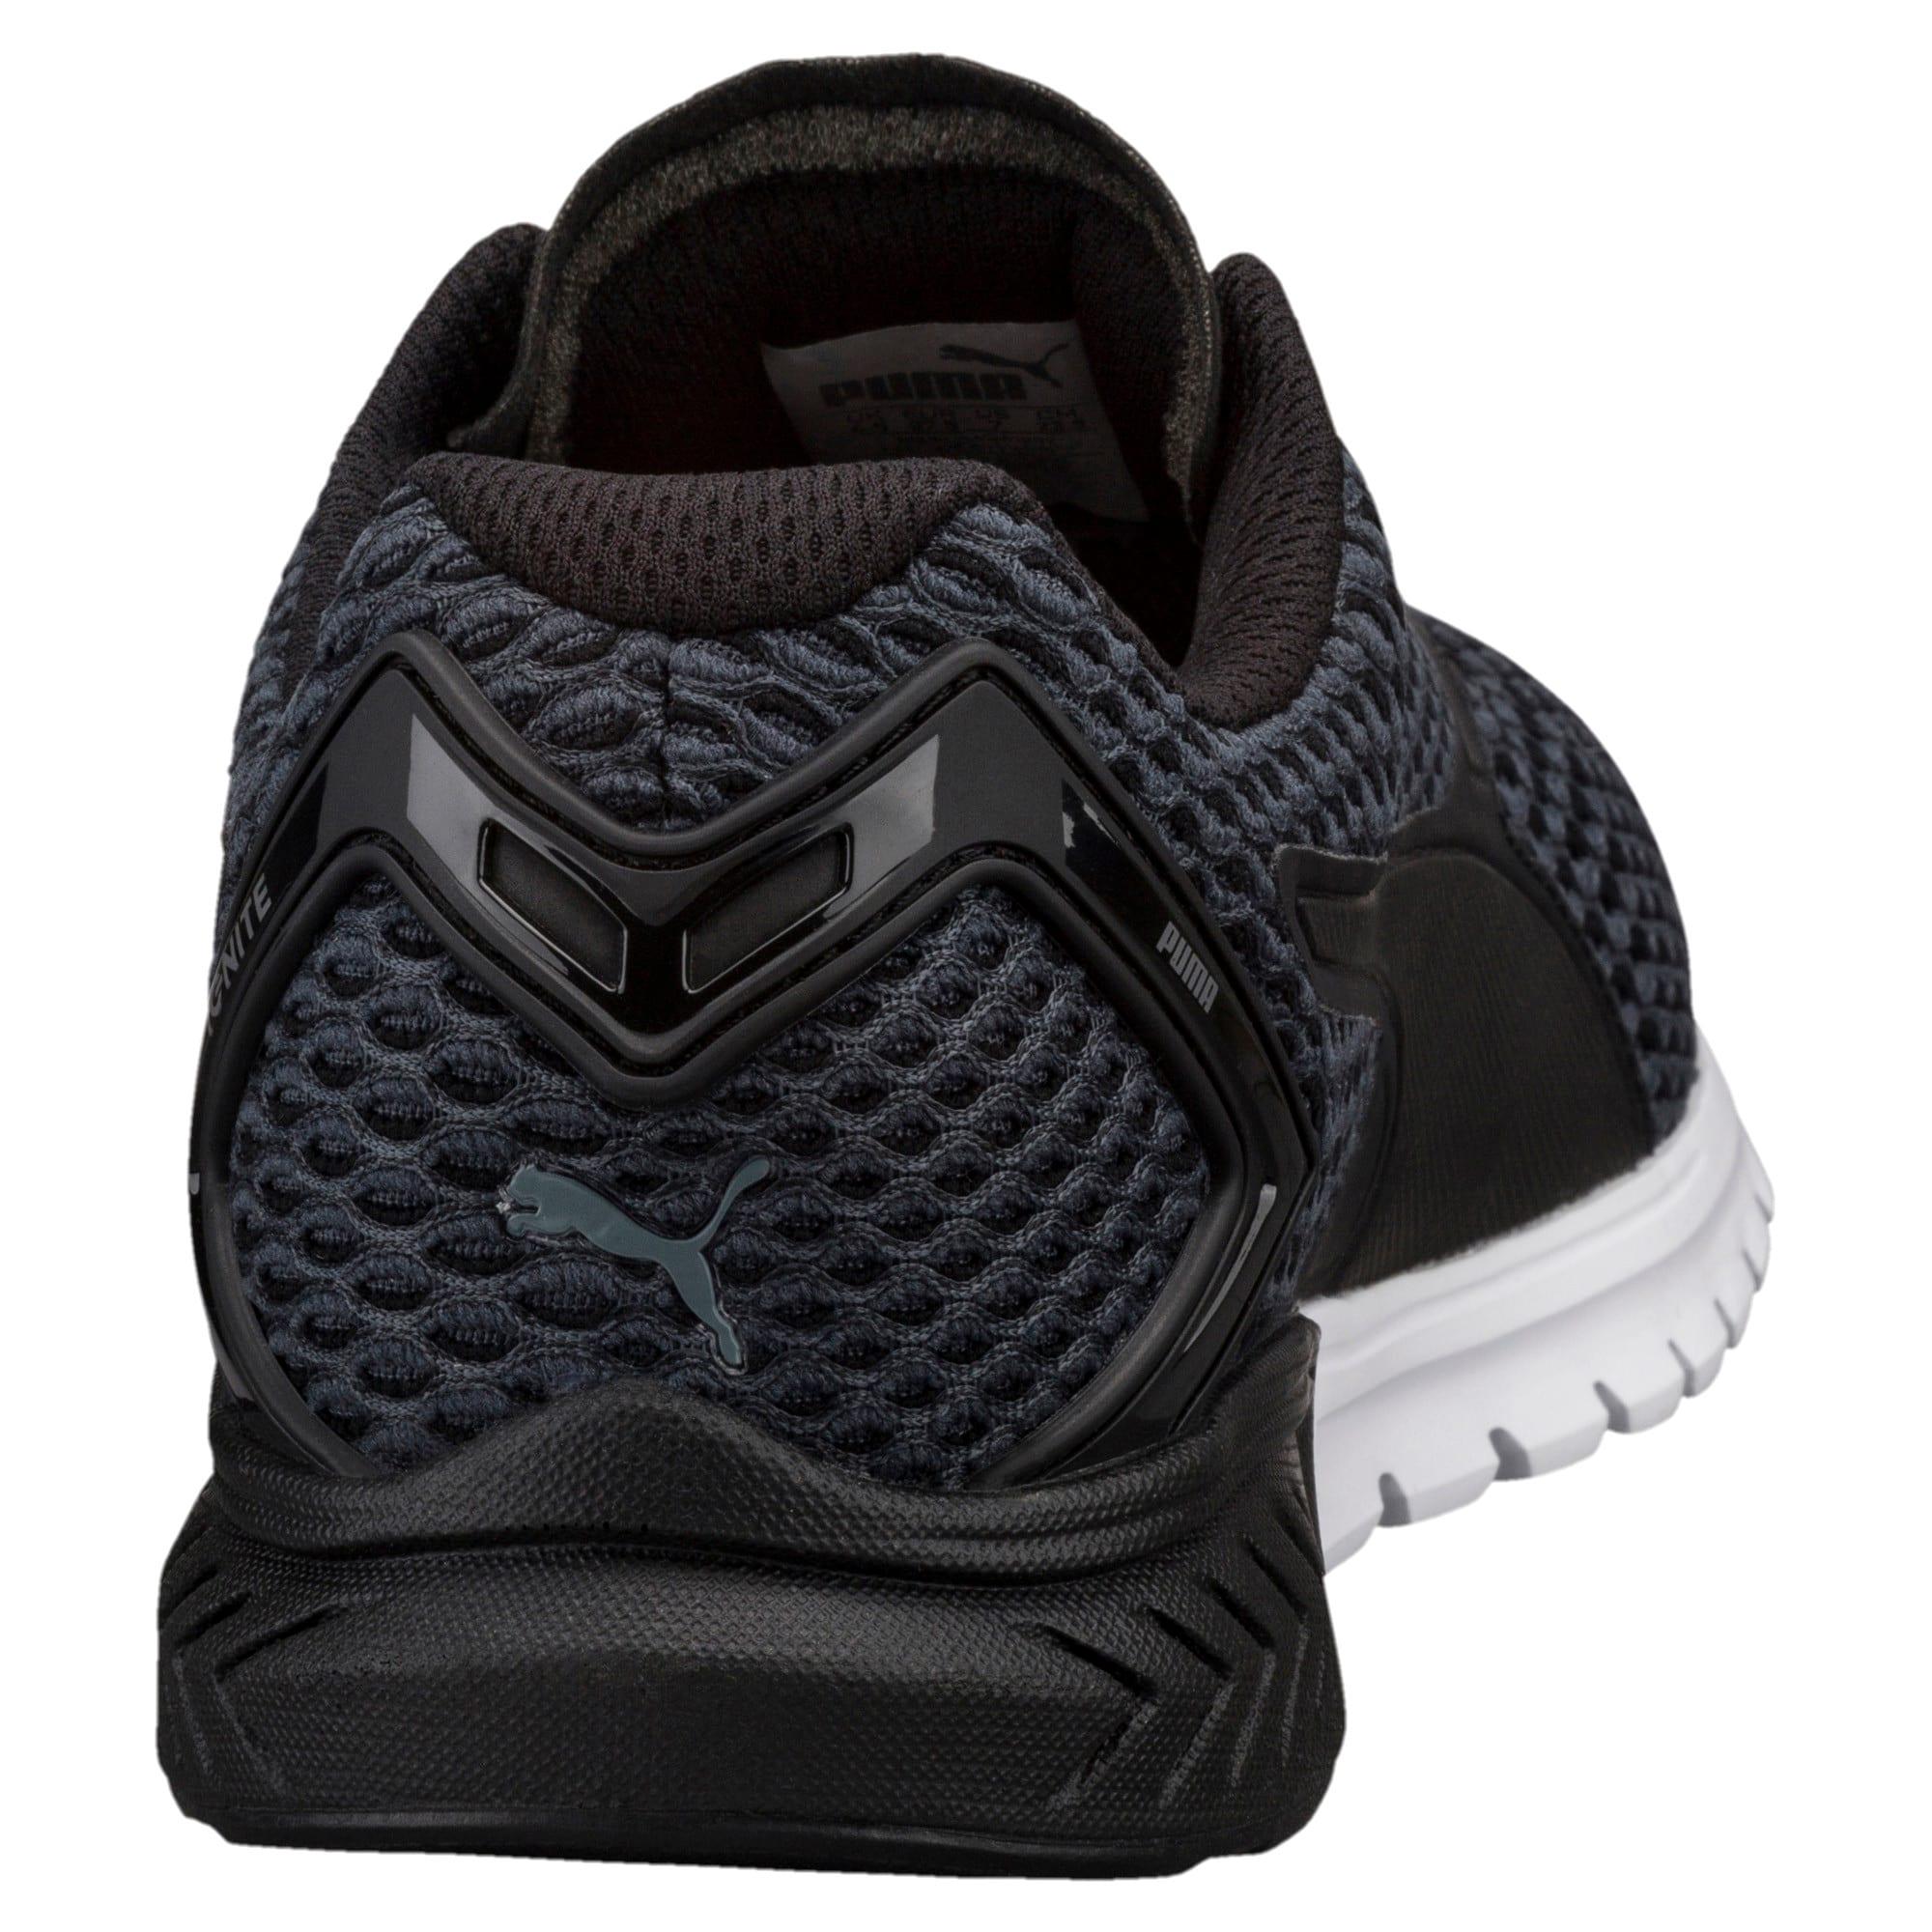 Thumbnail 4 of IGNITE Dual New Core Women's Training Shoes, Puma Black-Asphalt, medium-IND